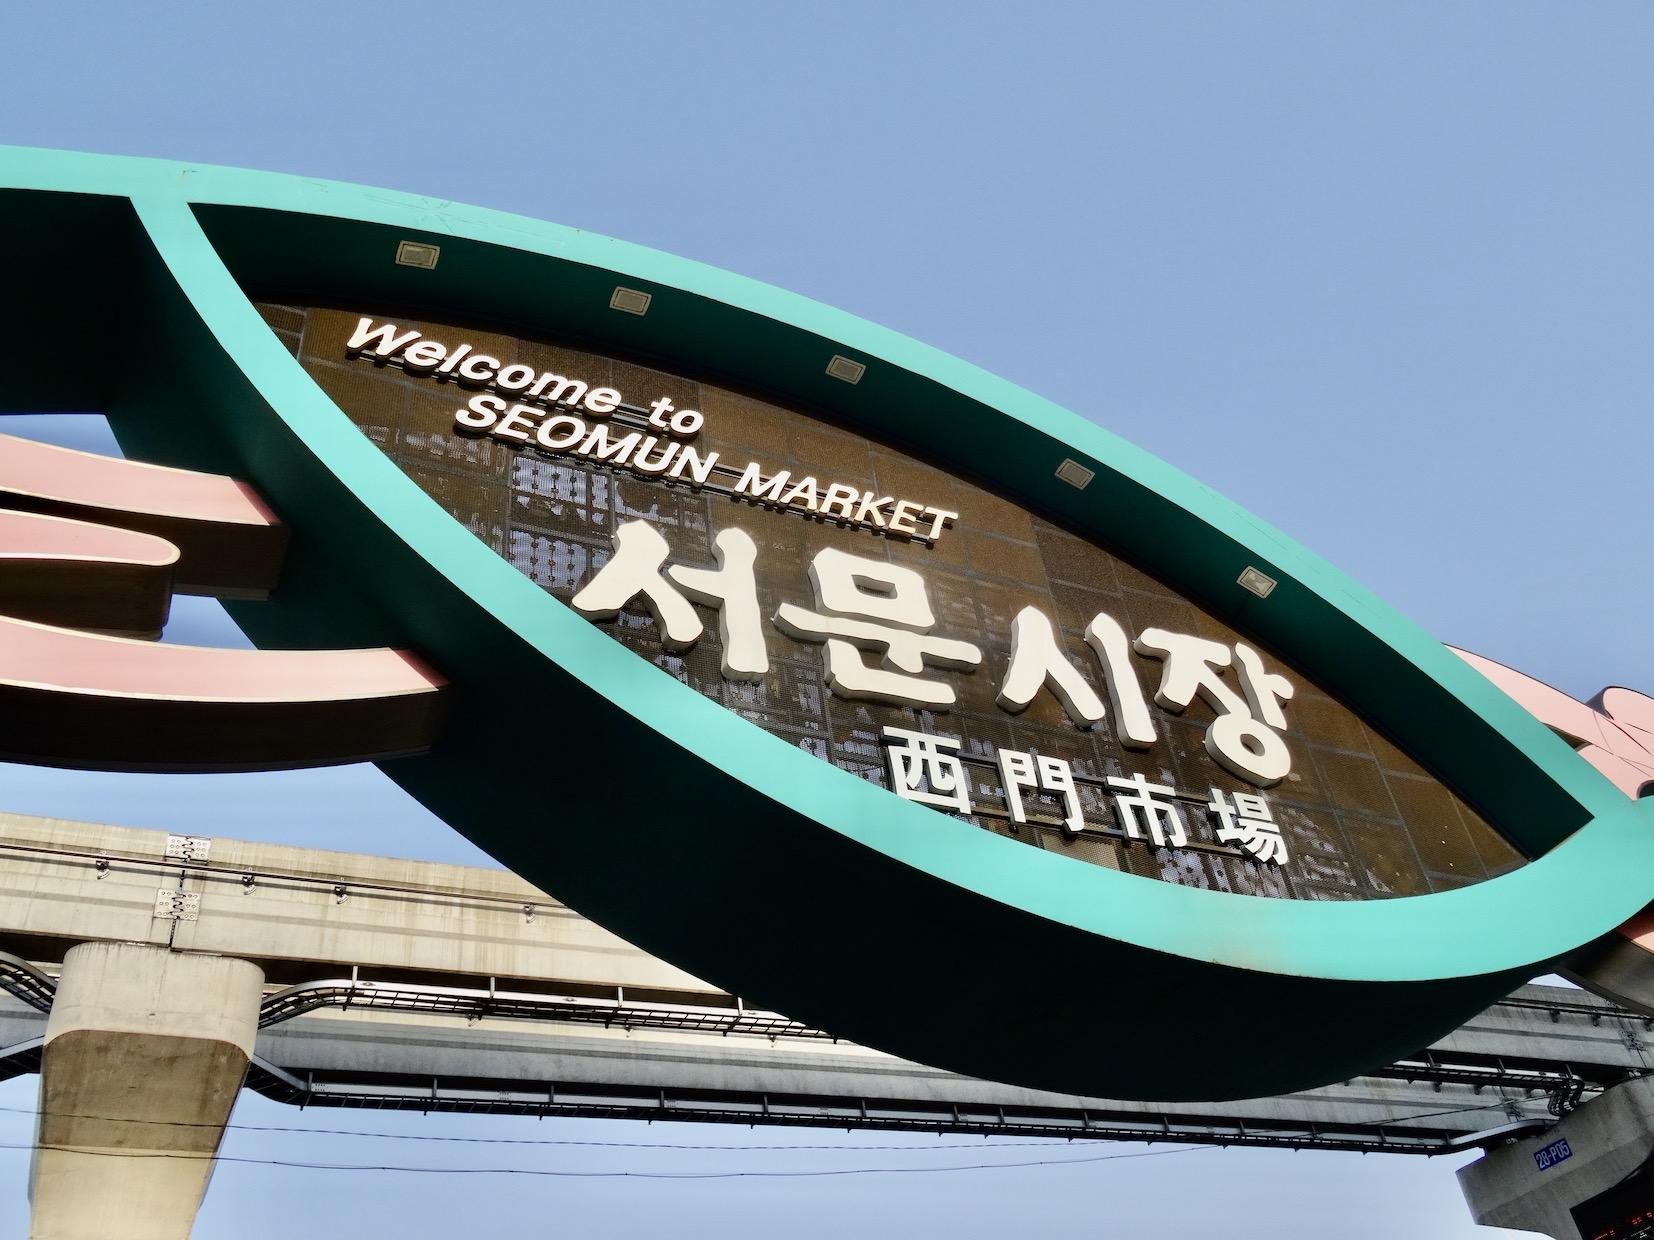 Seomun Market Daegu South Korea.